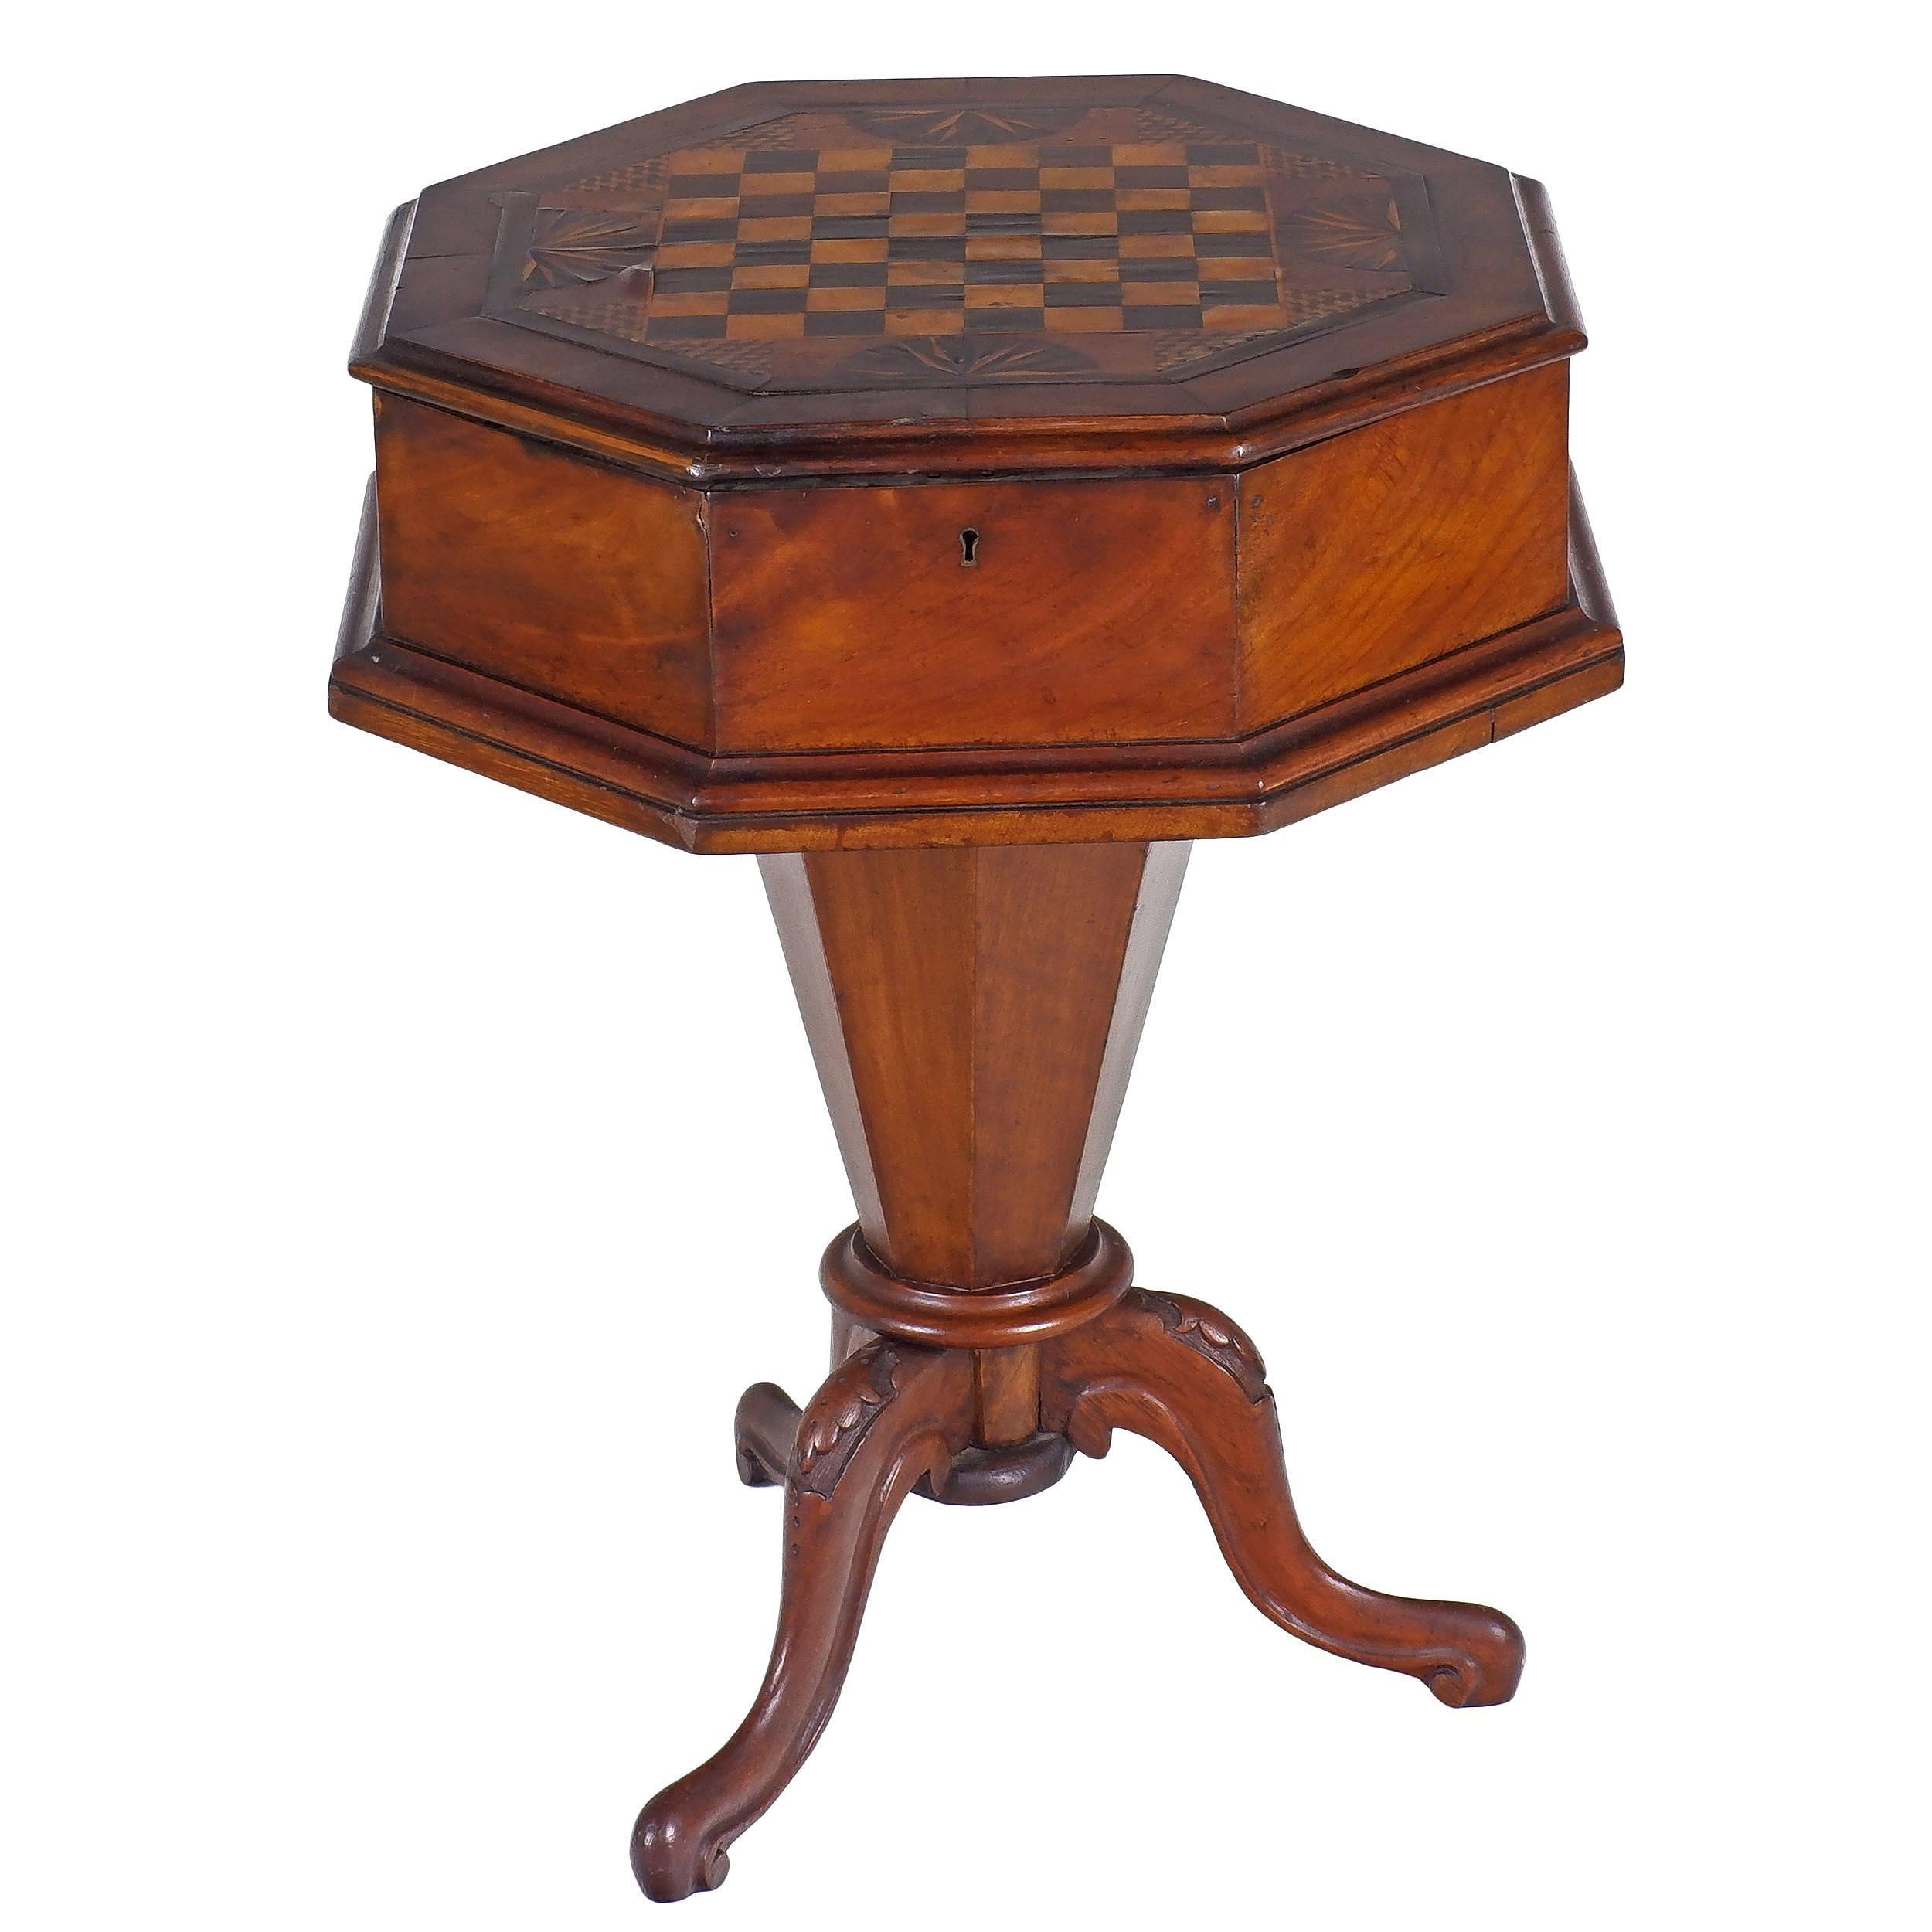 'Rare Australian Cedar and Specimen Timbers Inlaid Games Table 19th Century'